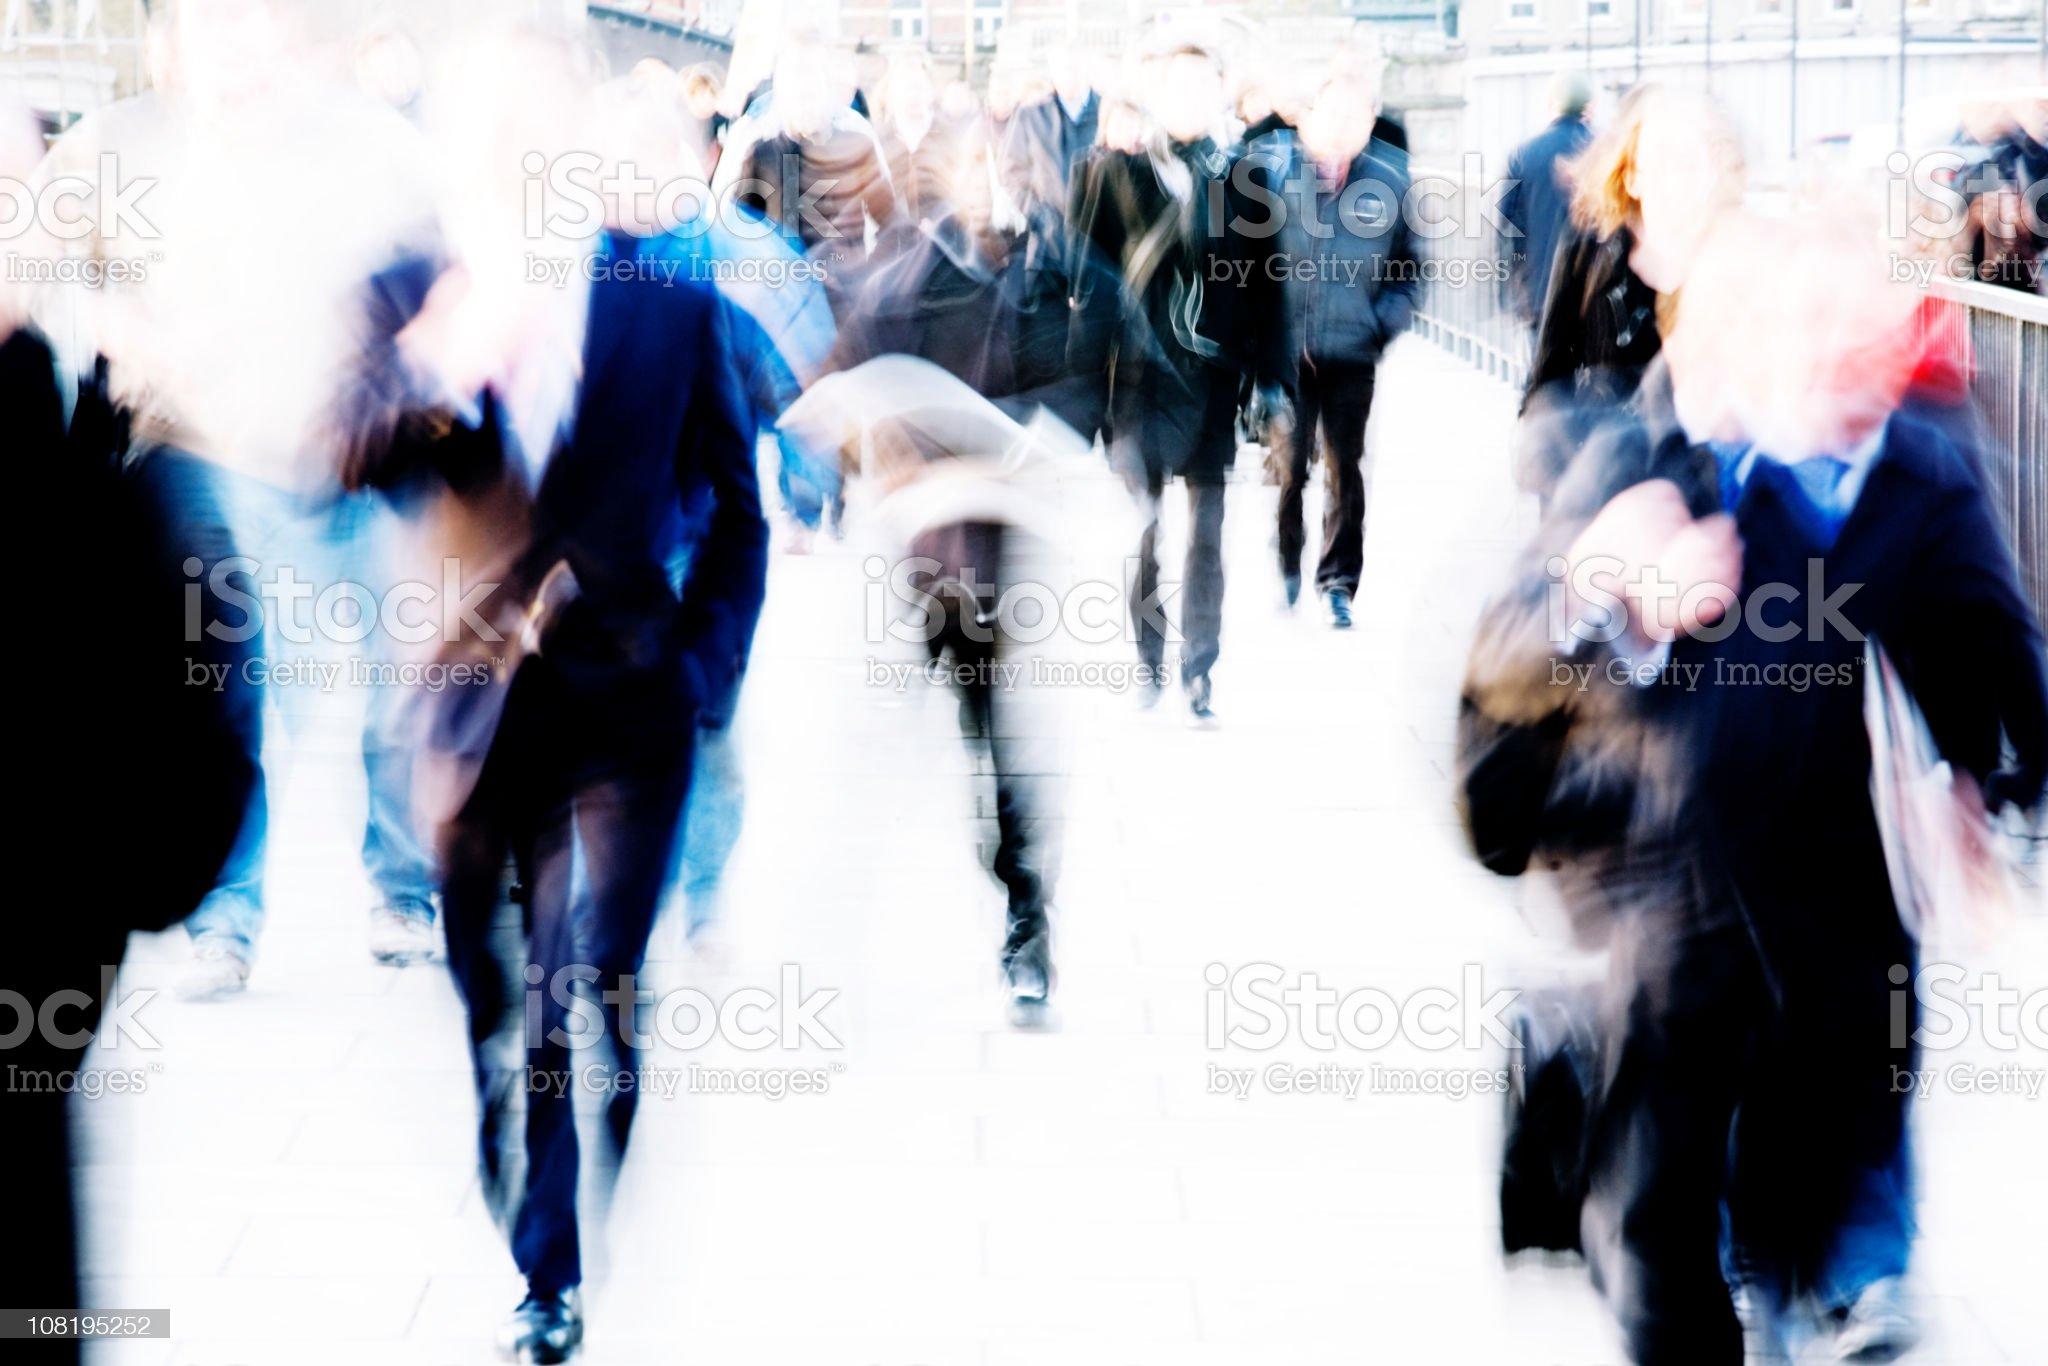 Commuter rush royalty-free stock photo